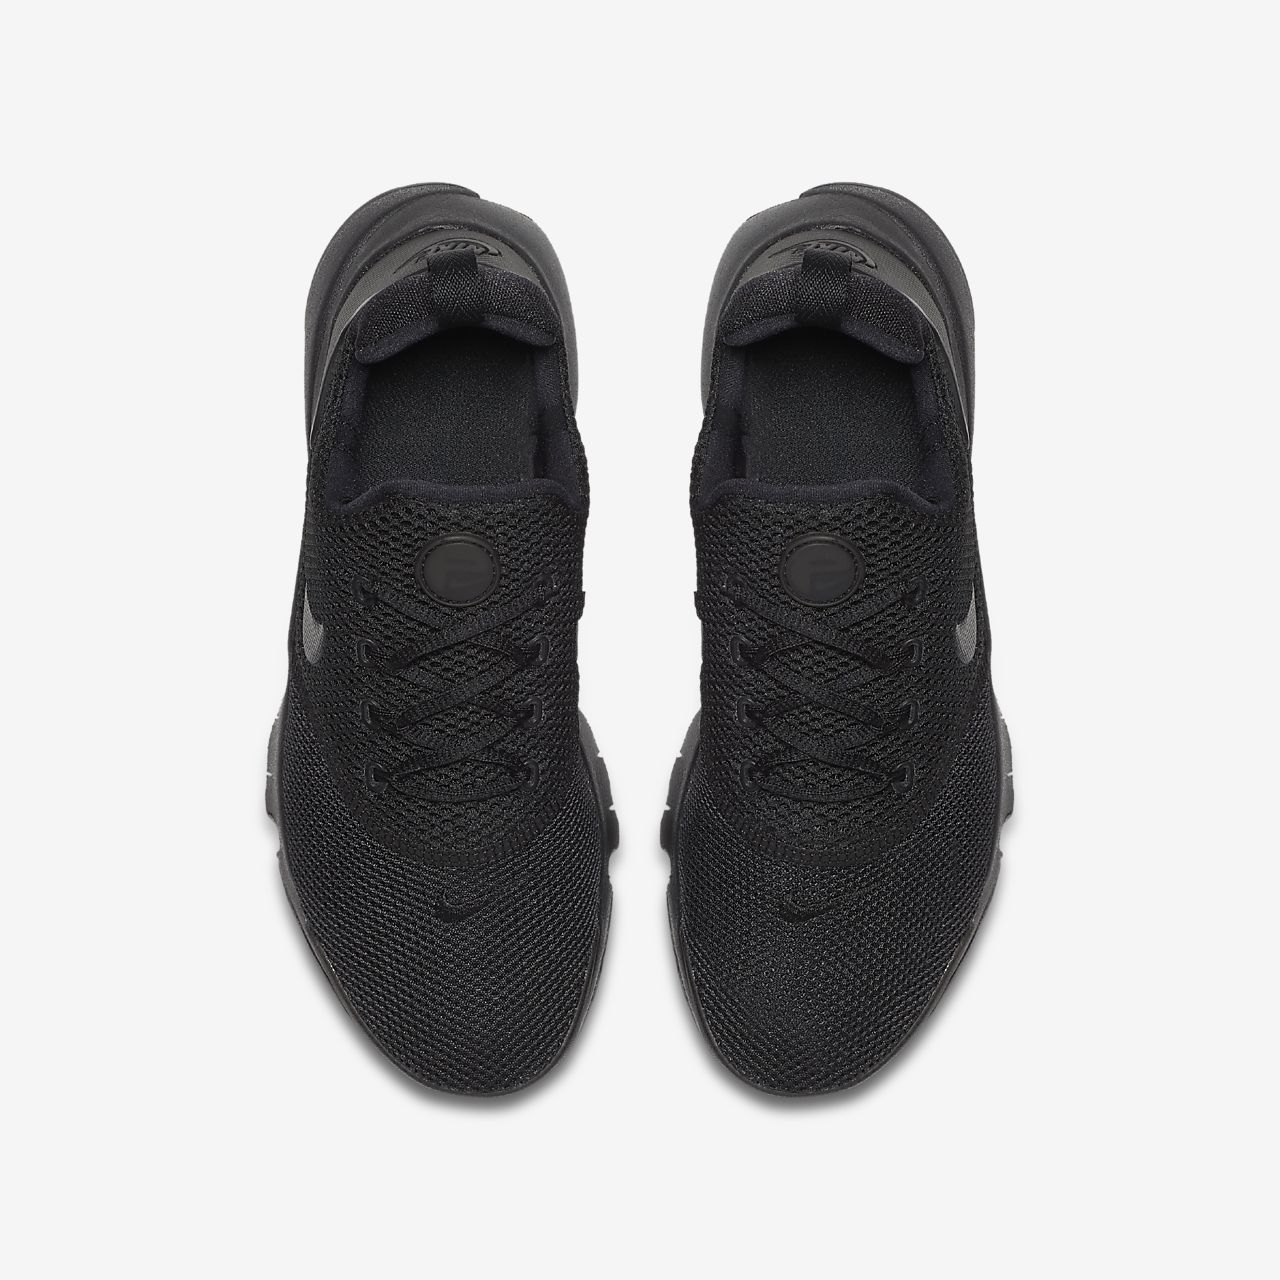 ecd4adcf1a6a Nike Presto Fly Older Kids  Shoe. Nike.com SI